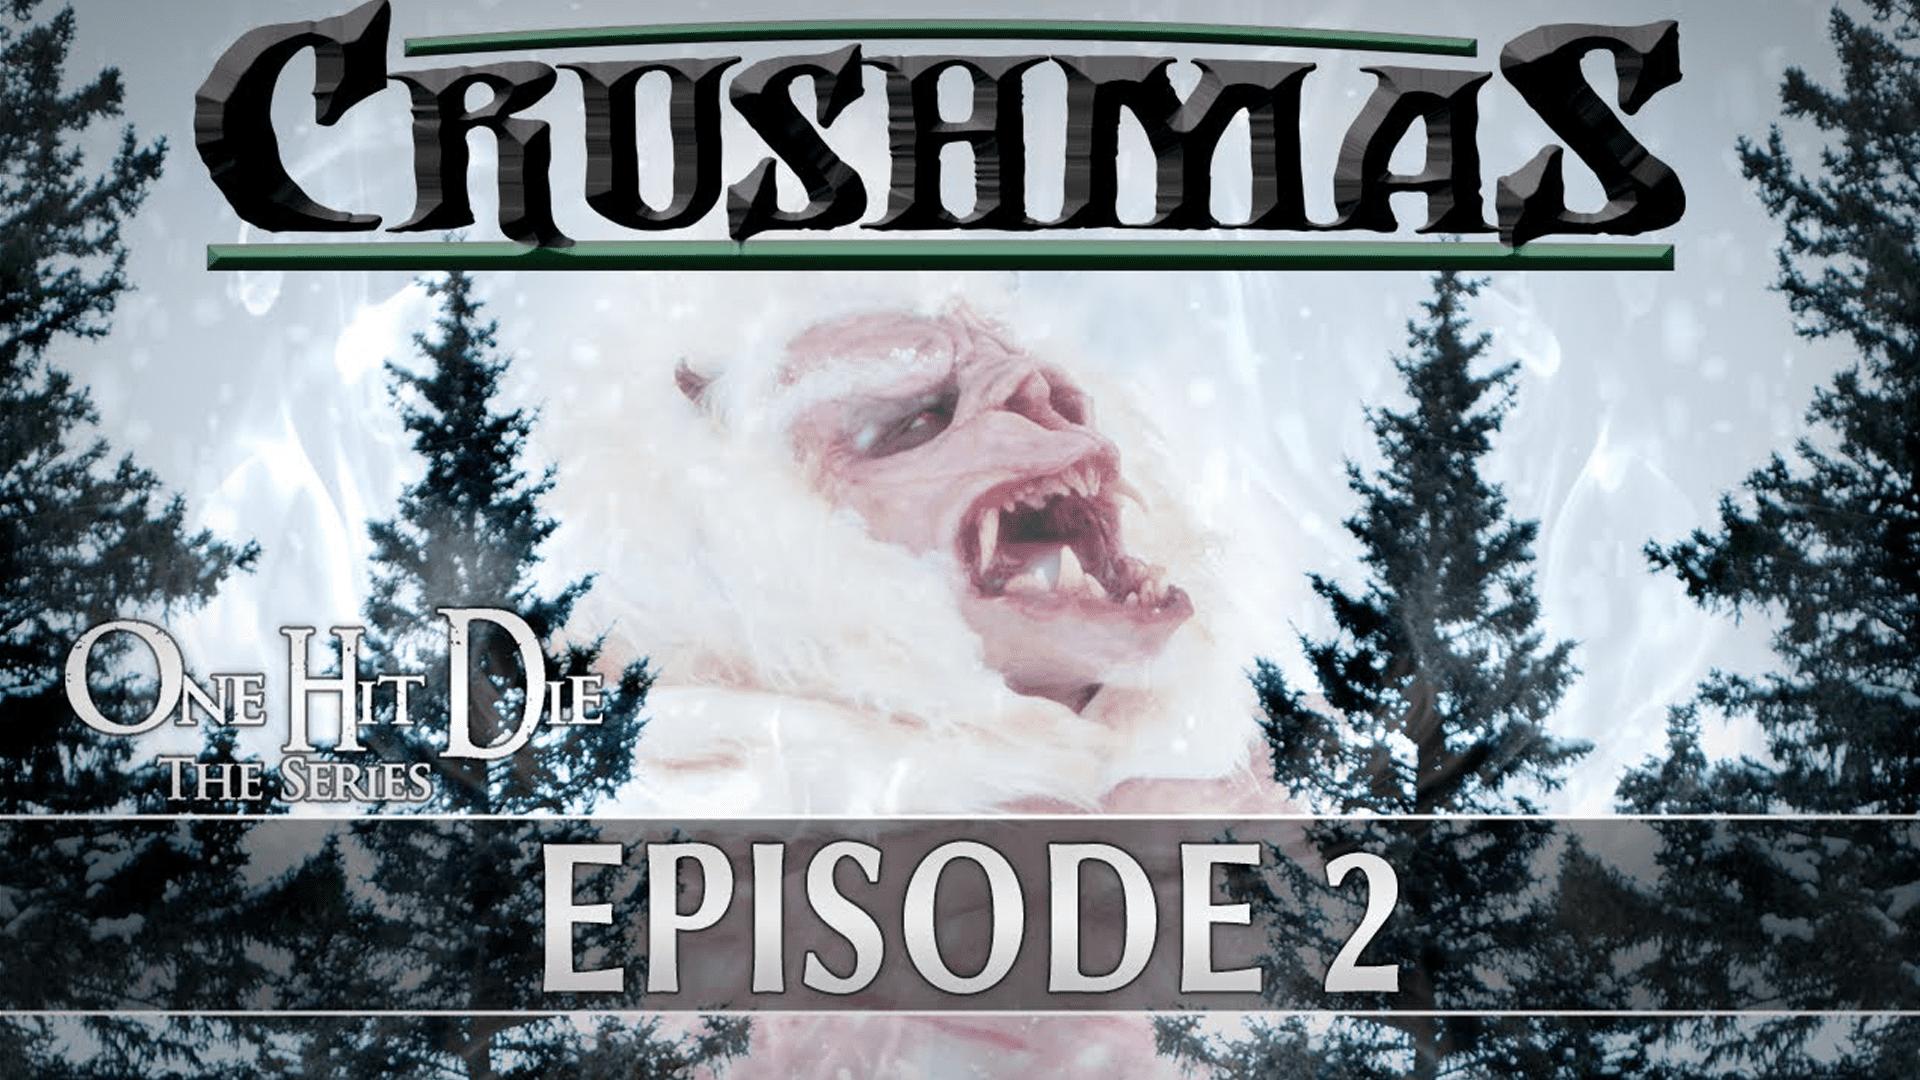 One Hit Die Crushmas Episode 2